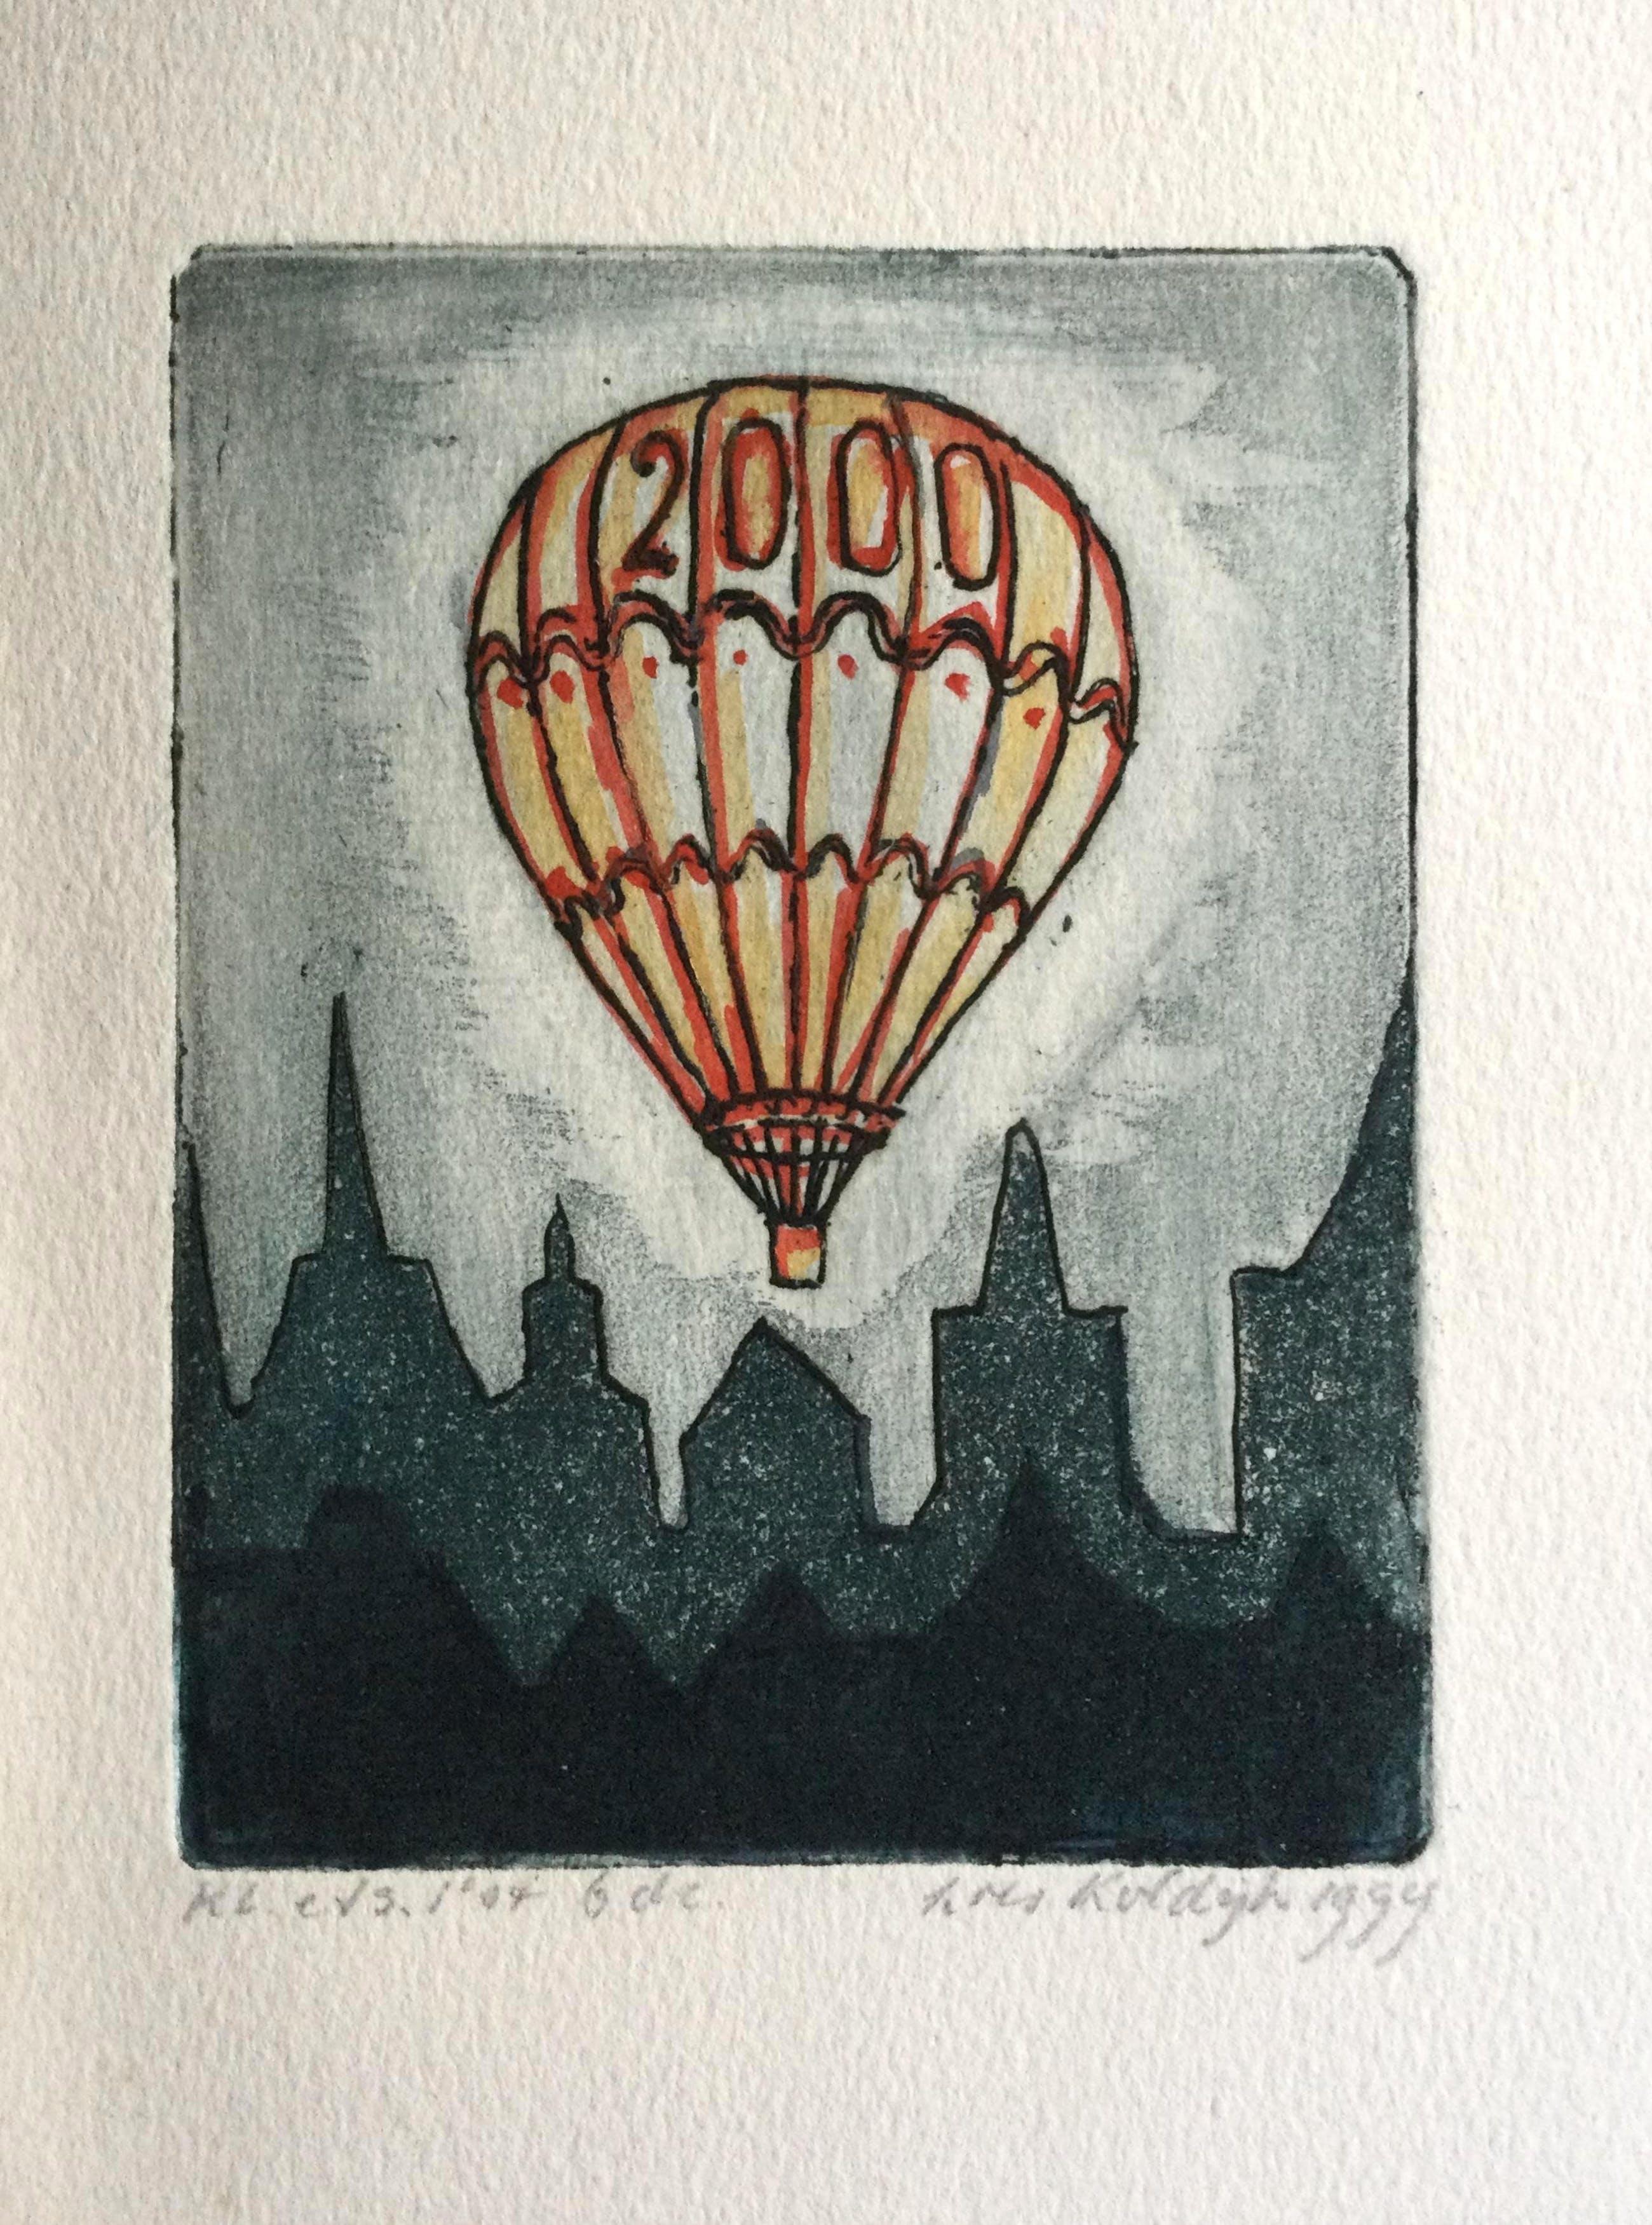 Loes Koldijk-Meyers - luchtballon, ets aquatint 1999 kopen? Bied vanaf 25!